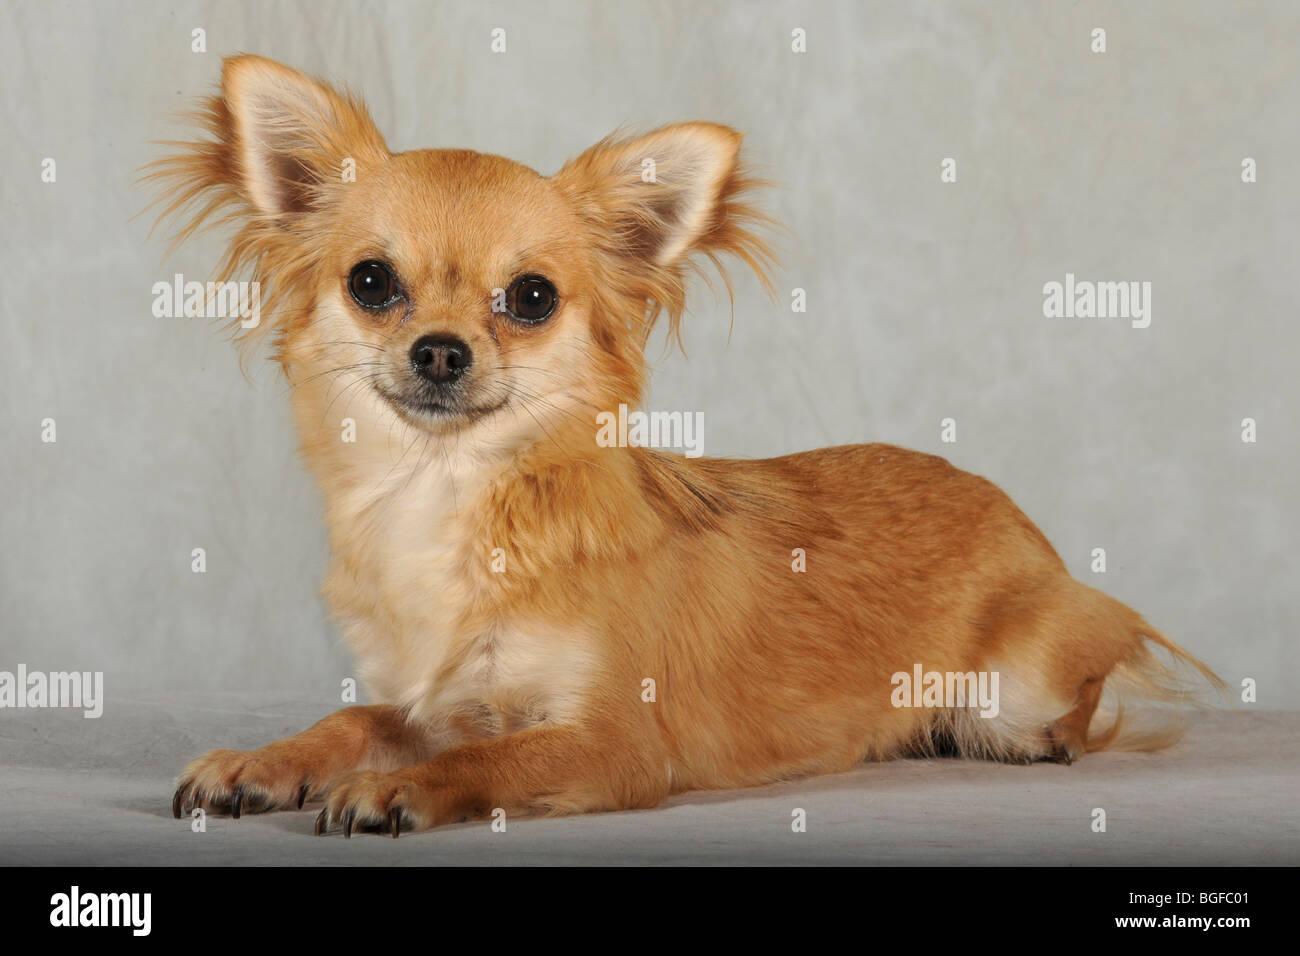 chihuahua dog - Stock Image